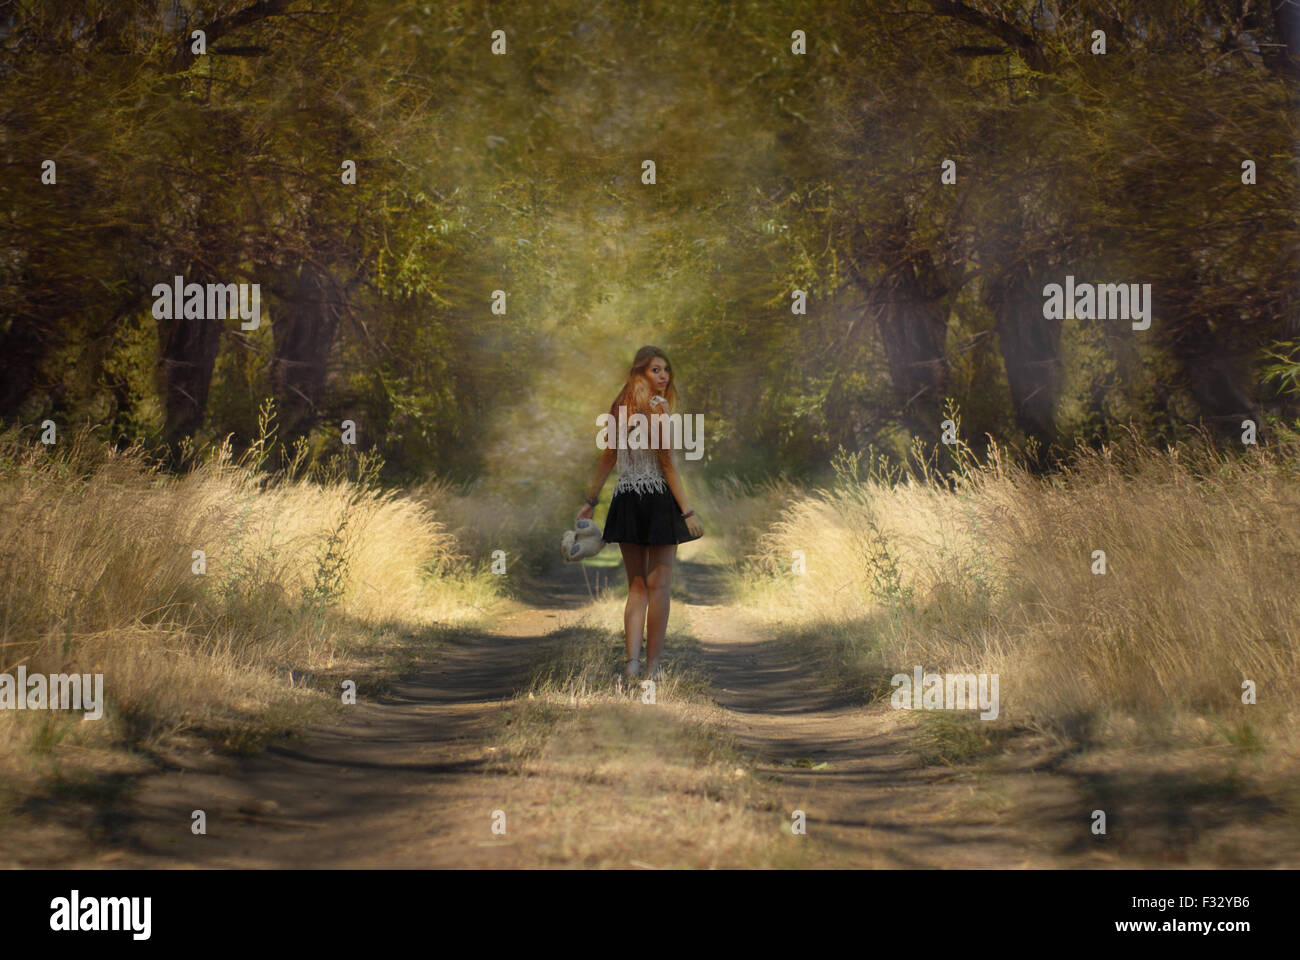 Großes Mädchen zu Fuß Trouhgt den Wald im Rückblick Stockbild